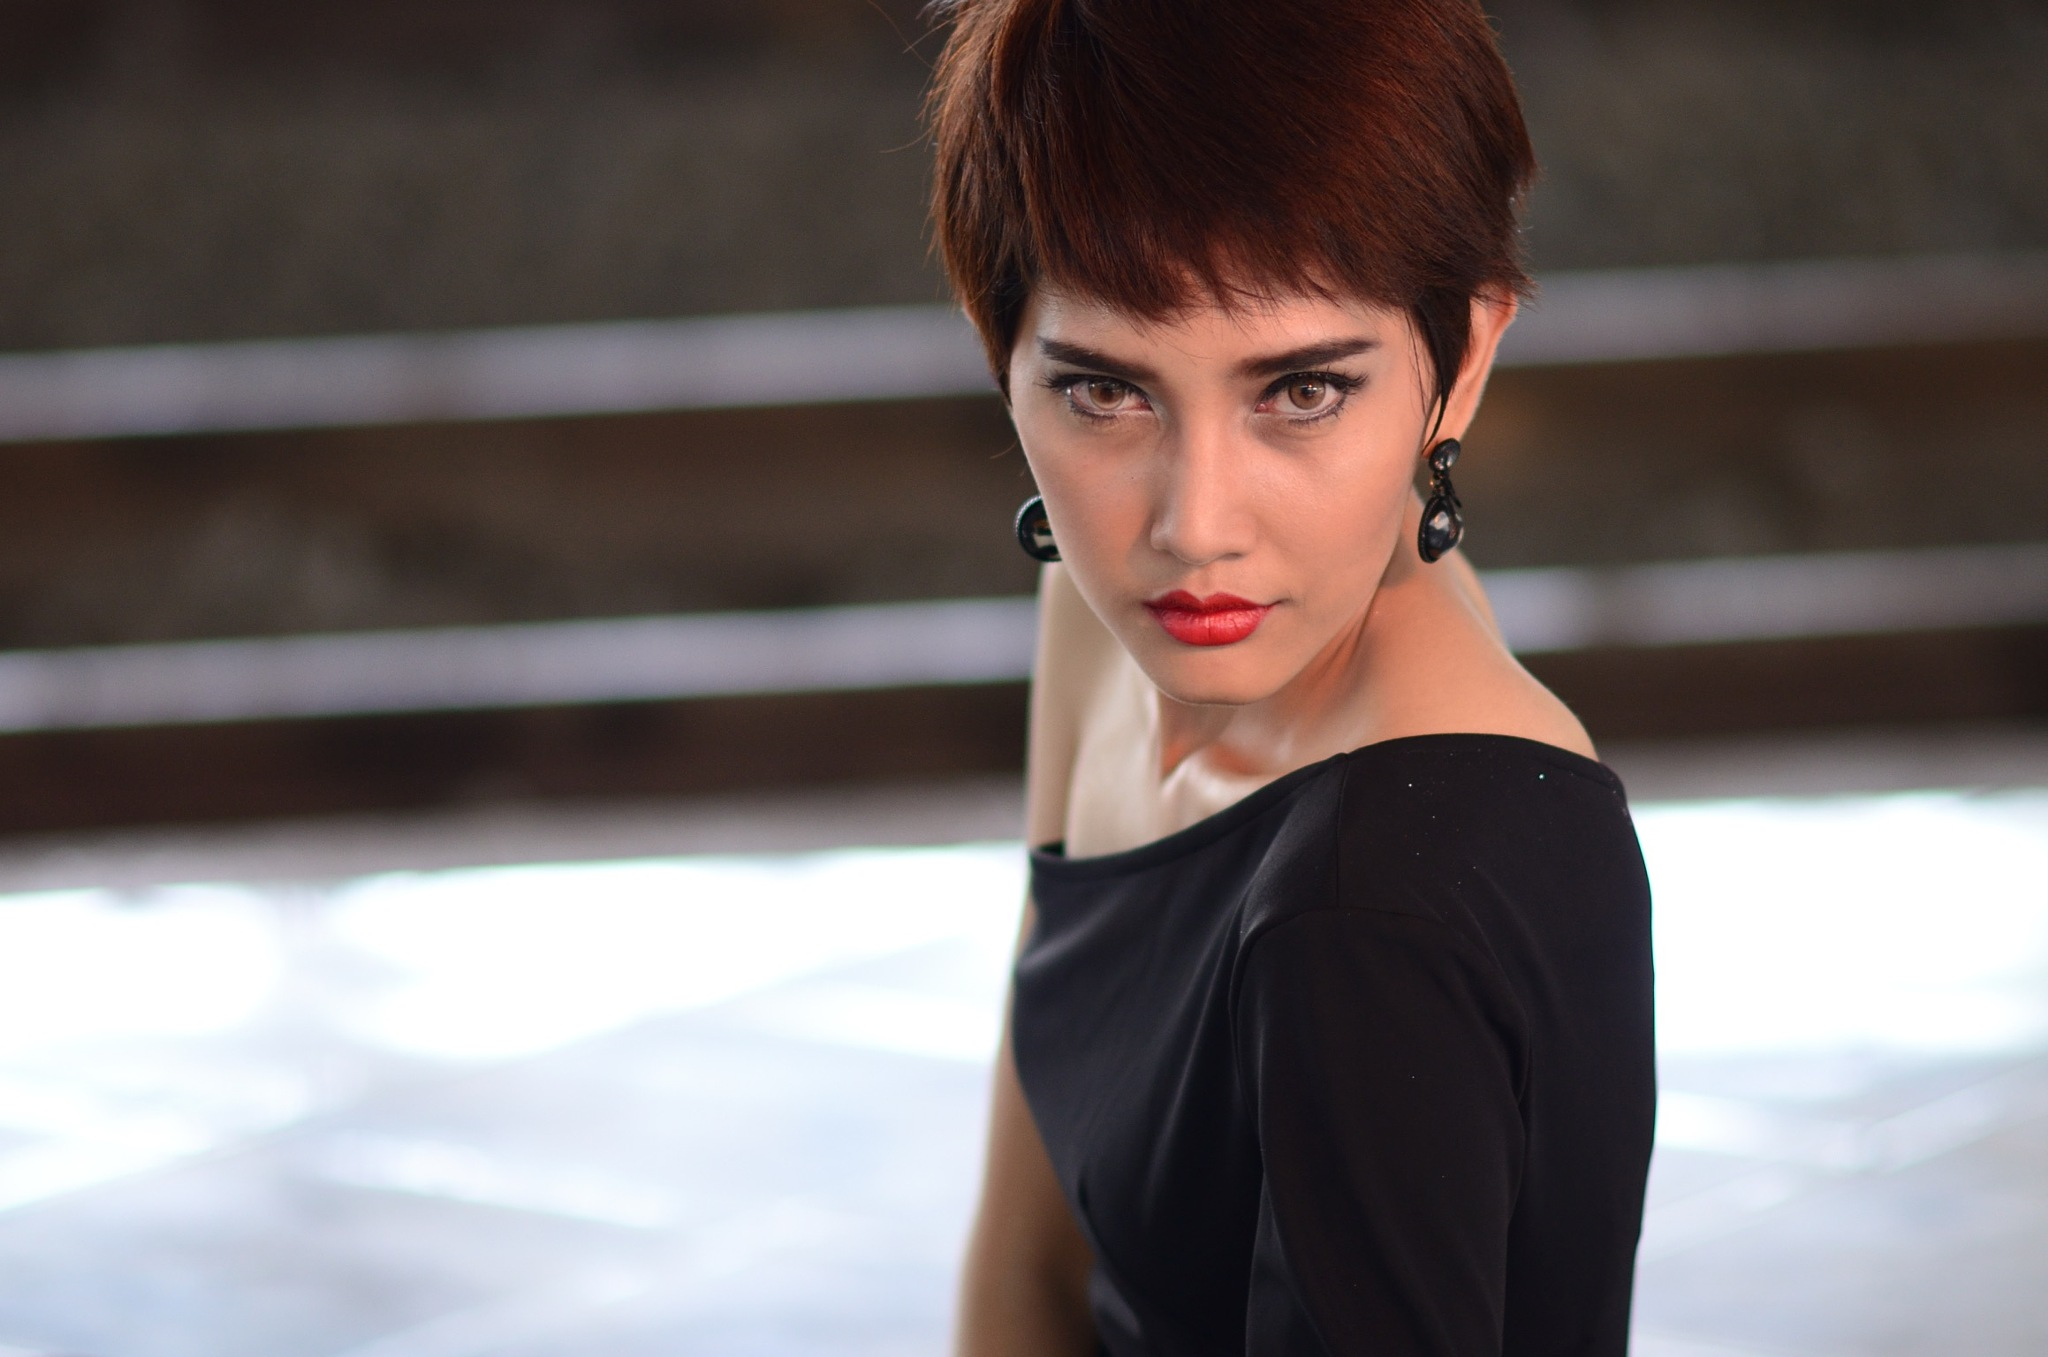 Indri by Yulius